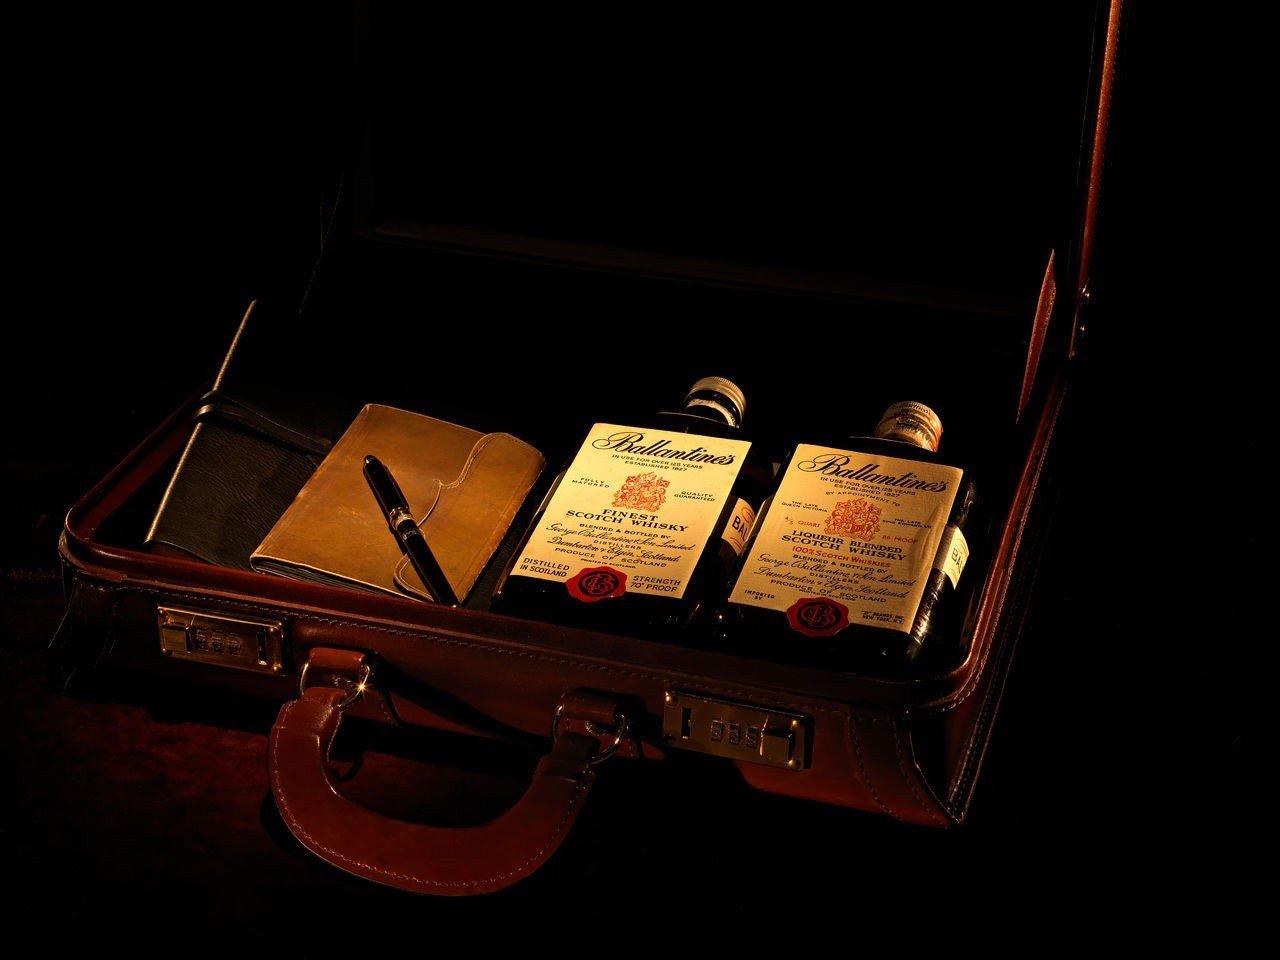 ballantines scotch whisky in case